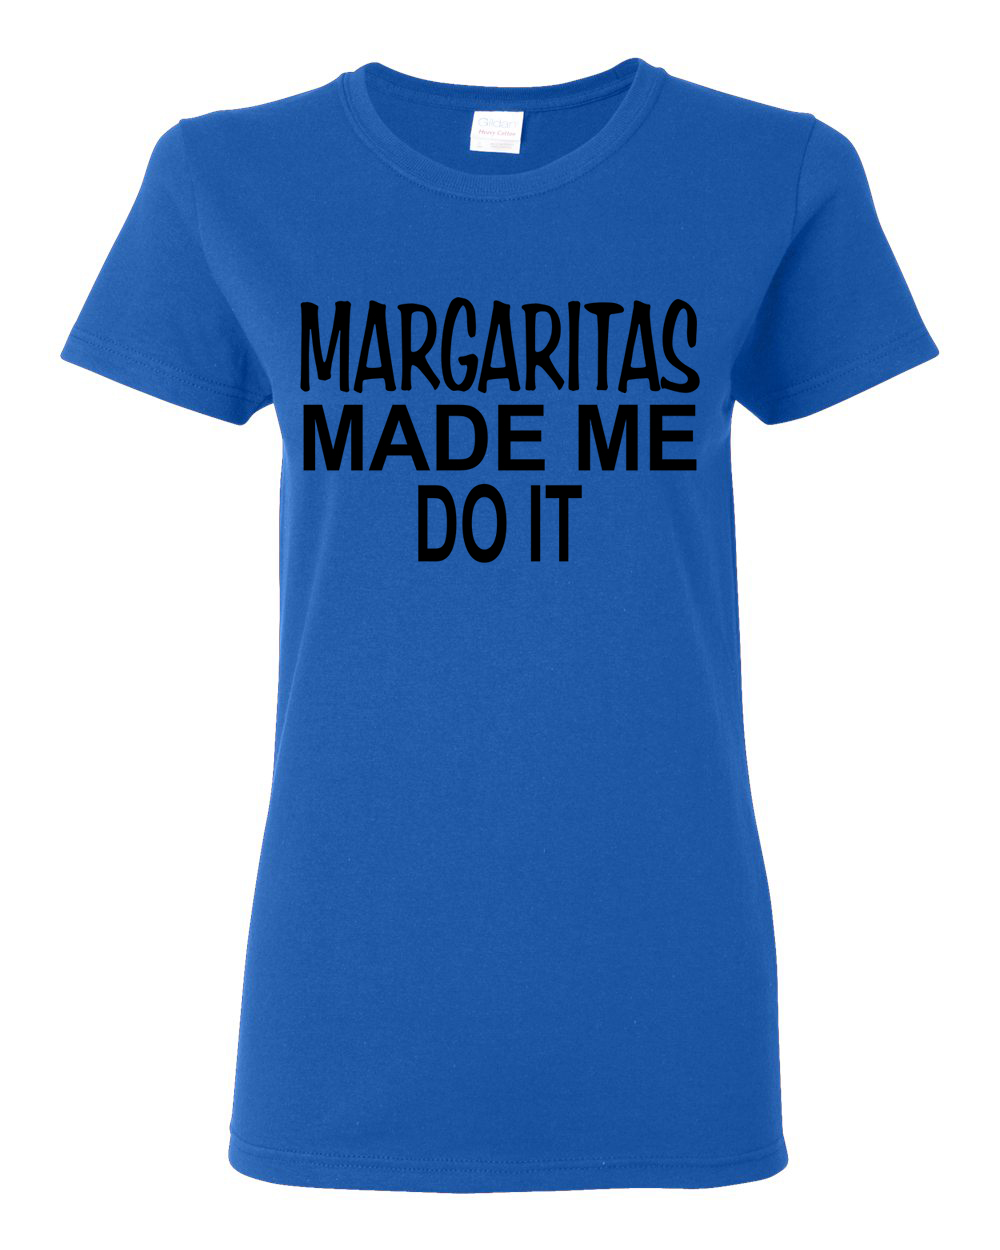 Custom Apparel R Us Margaritas Made Me Do It Funny Shirt Womens T